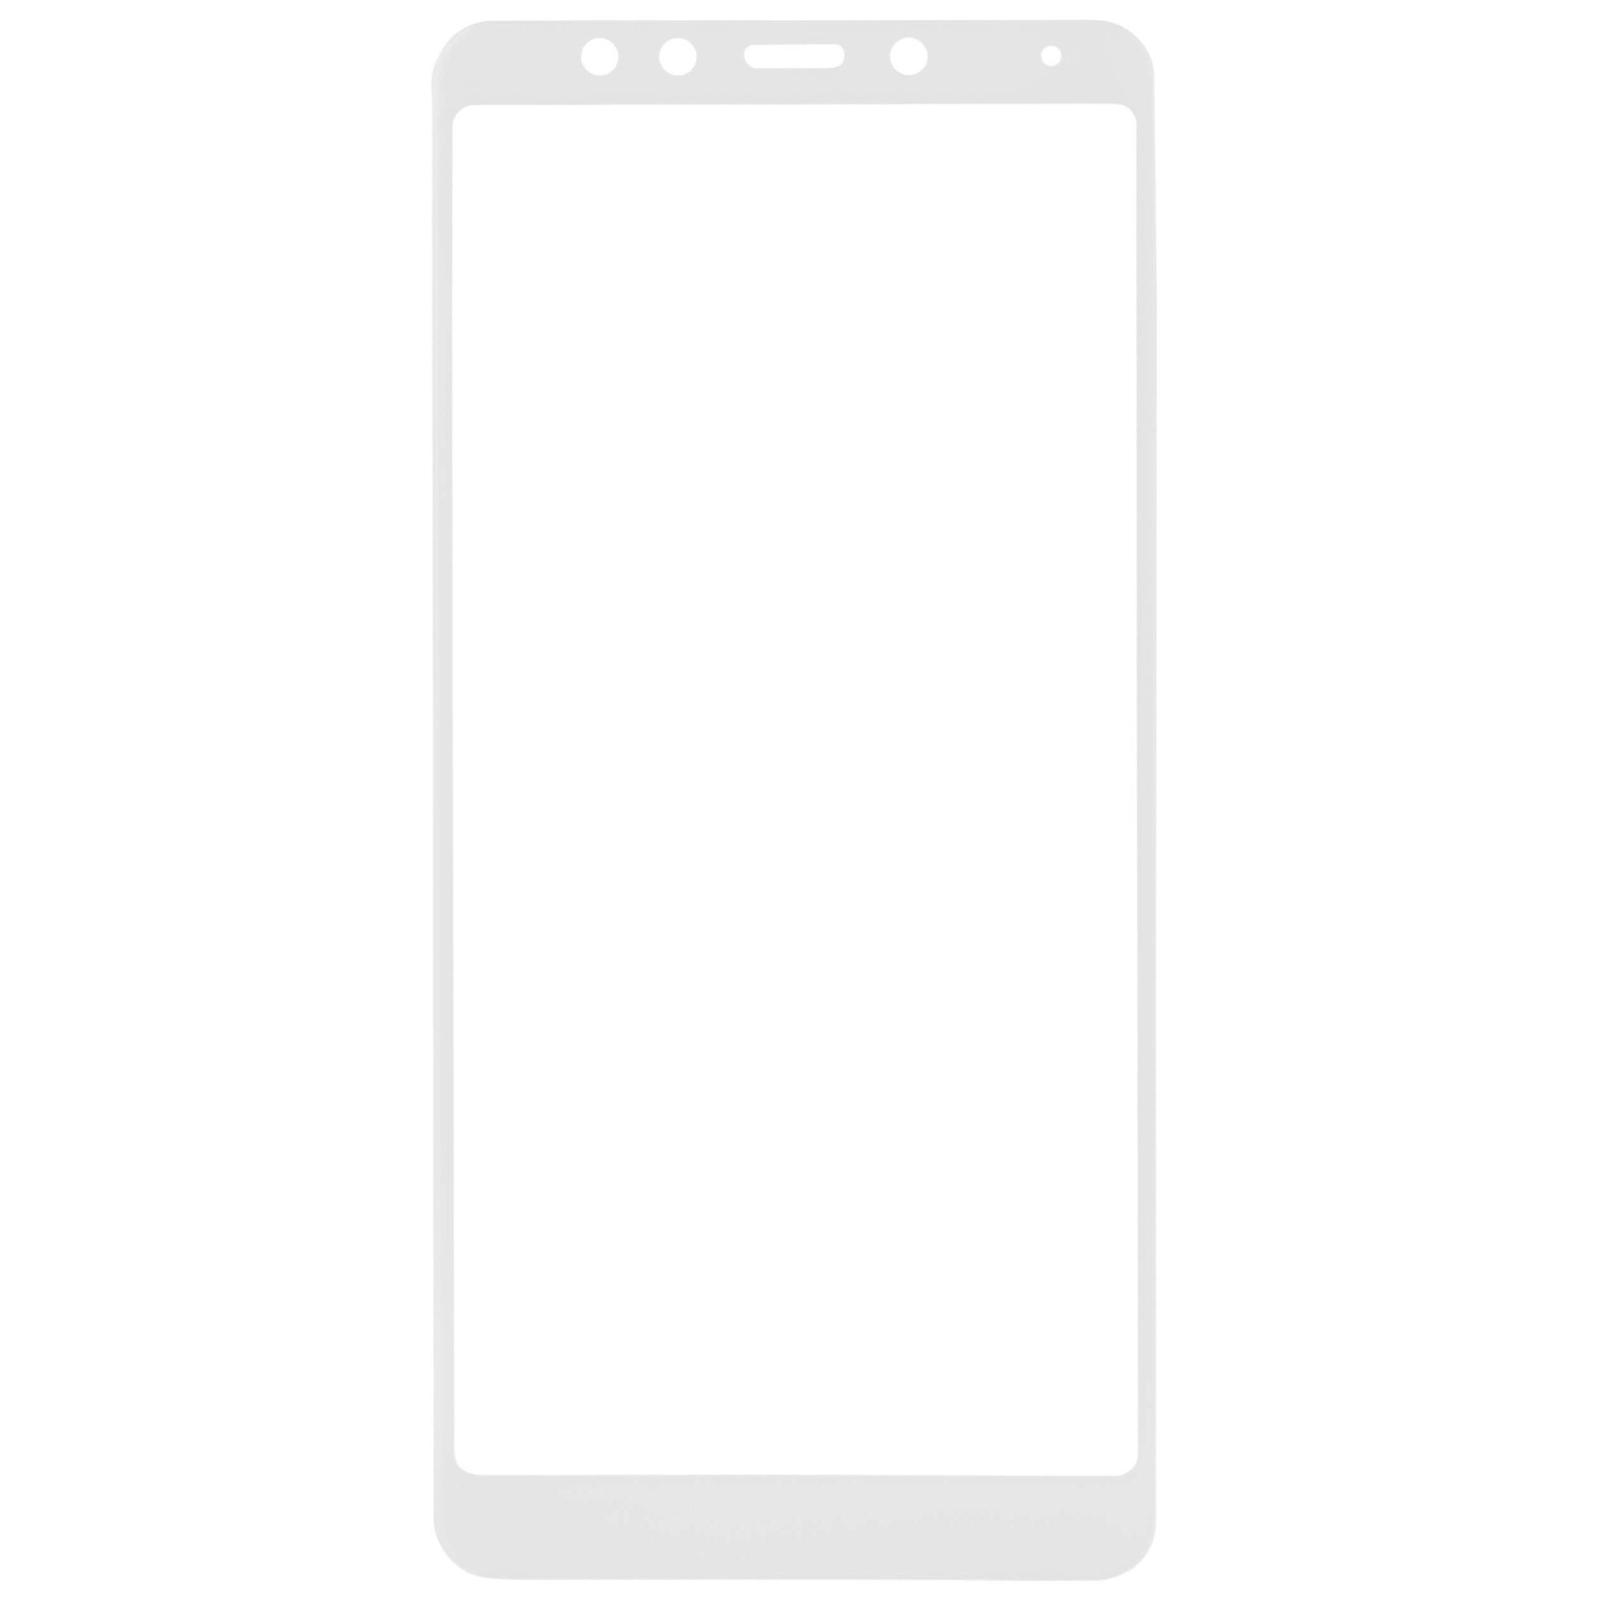 Стекло защитное MakeFuture для Xiaomi Redmi 5 Plus White Full Cover (MGFC-XR5PW) изображение 3